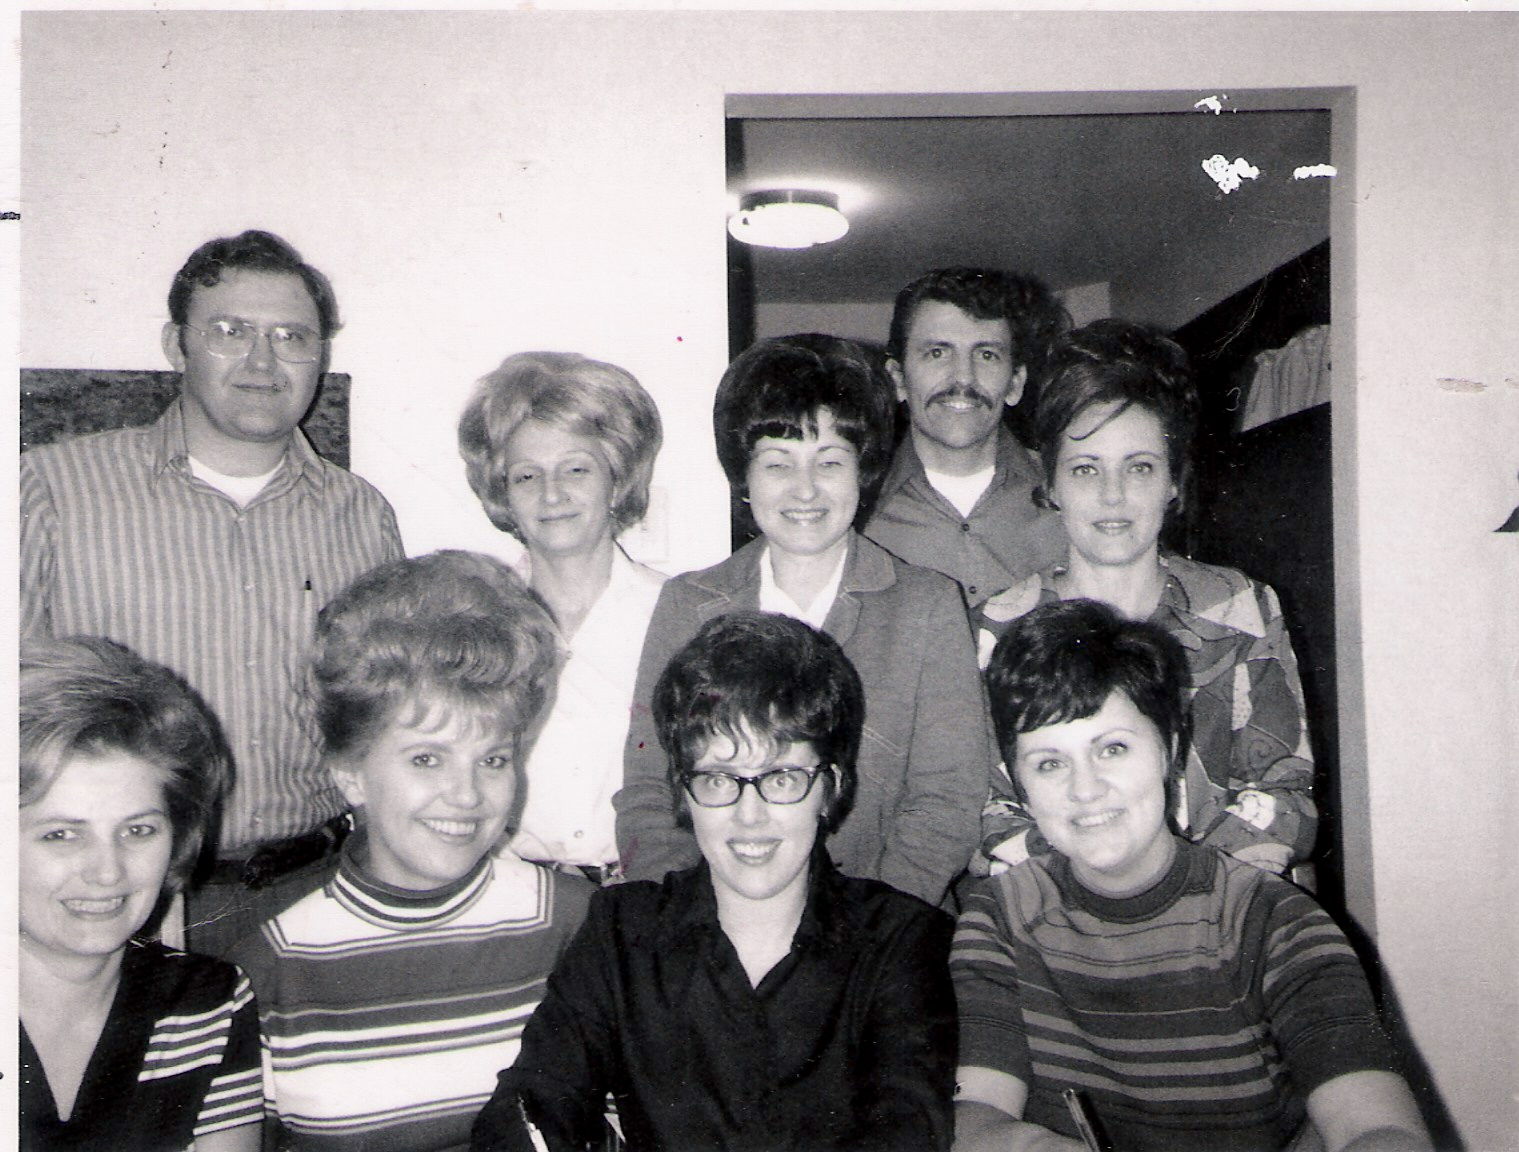 http://orhs.tripod.com/1972_reunion_comittee.jpg